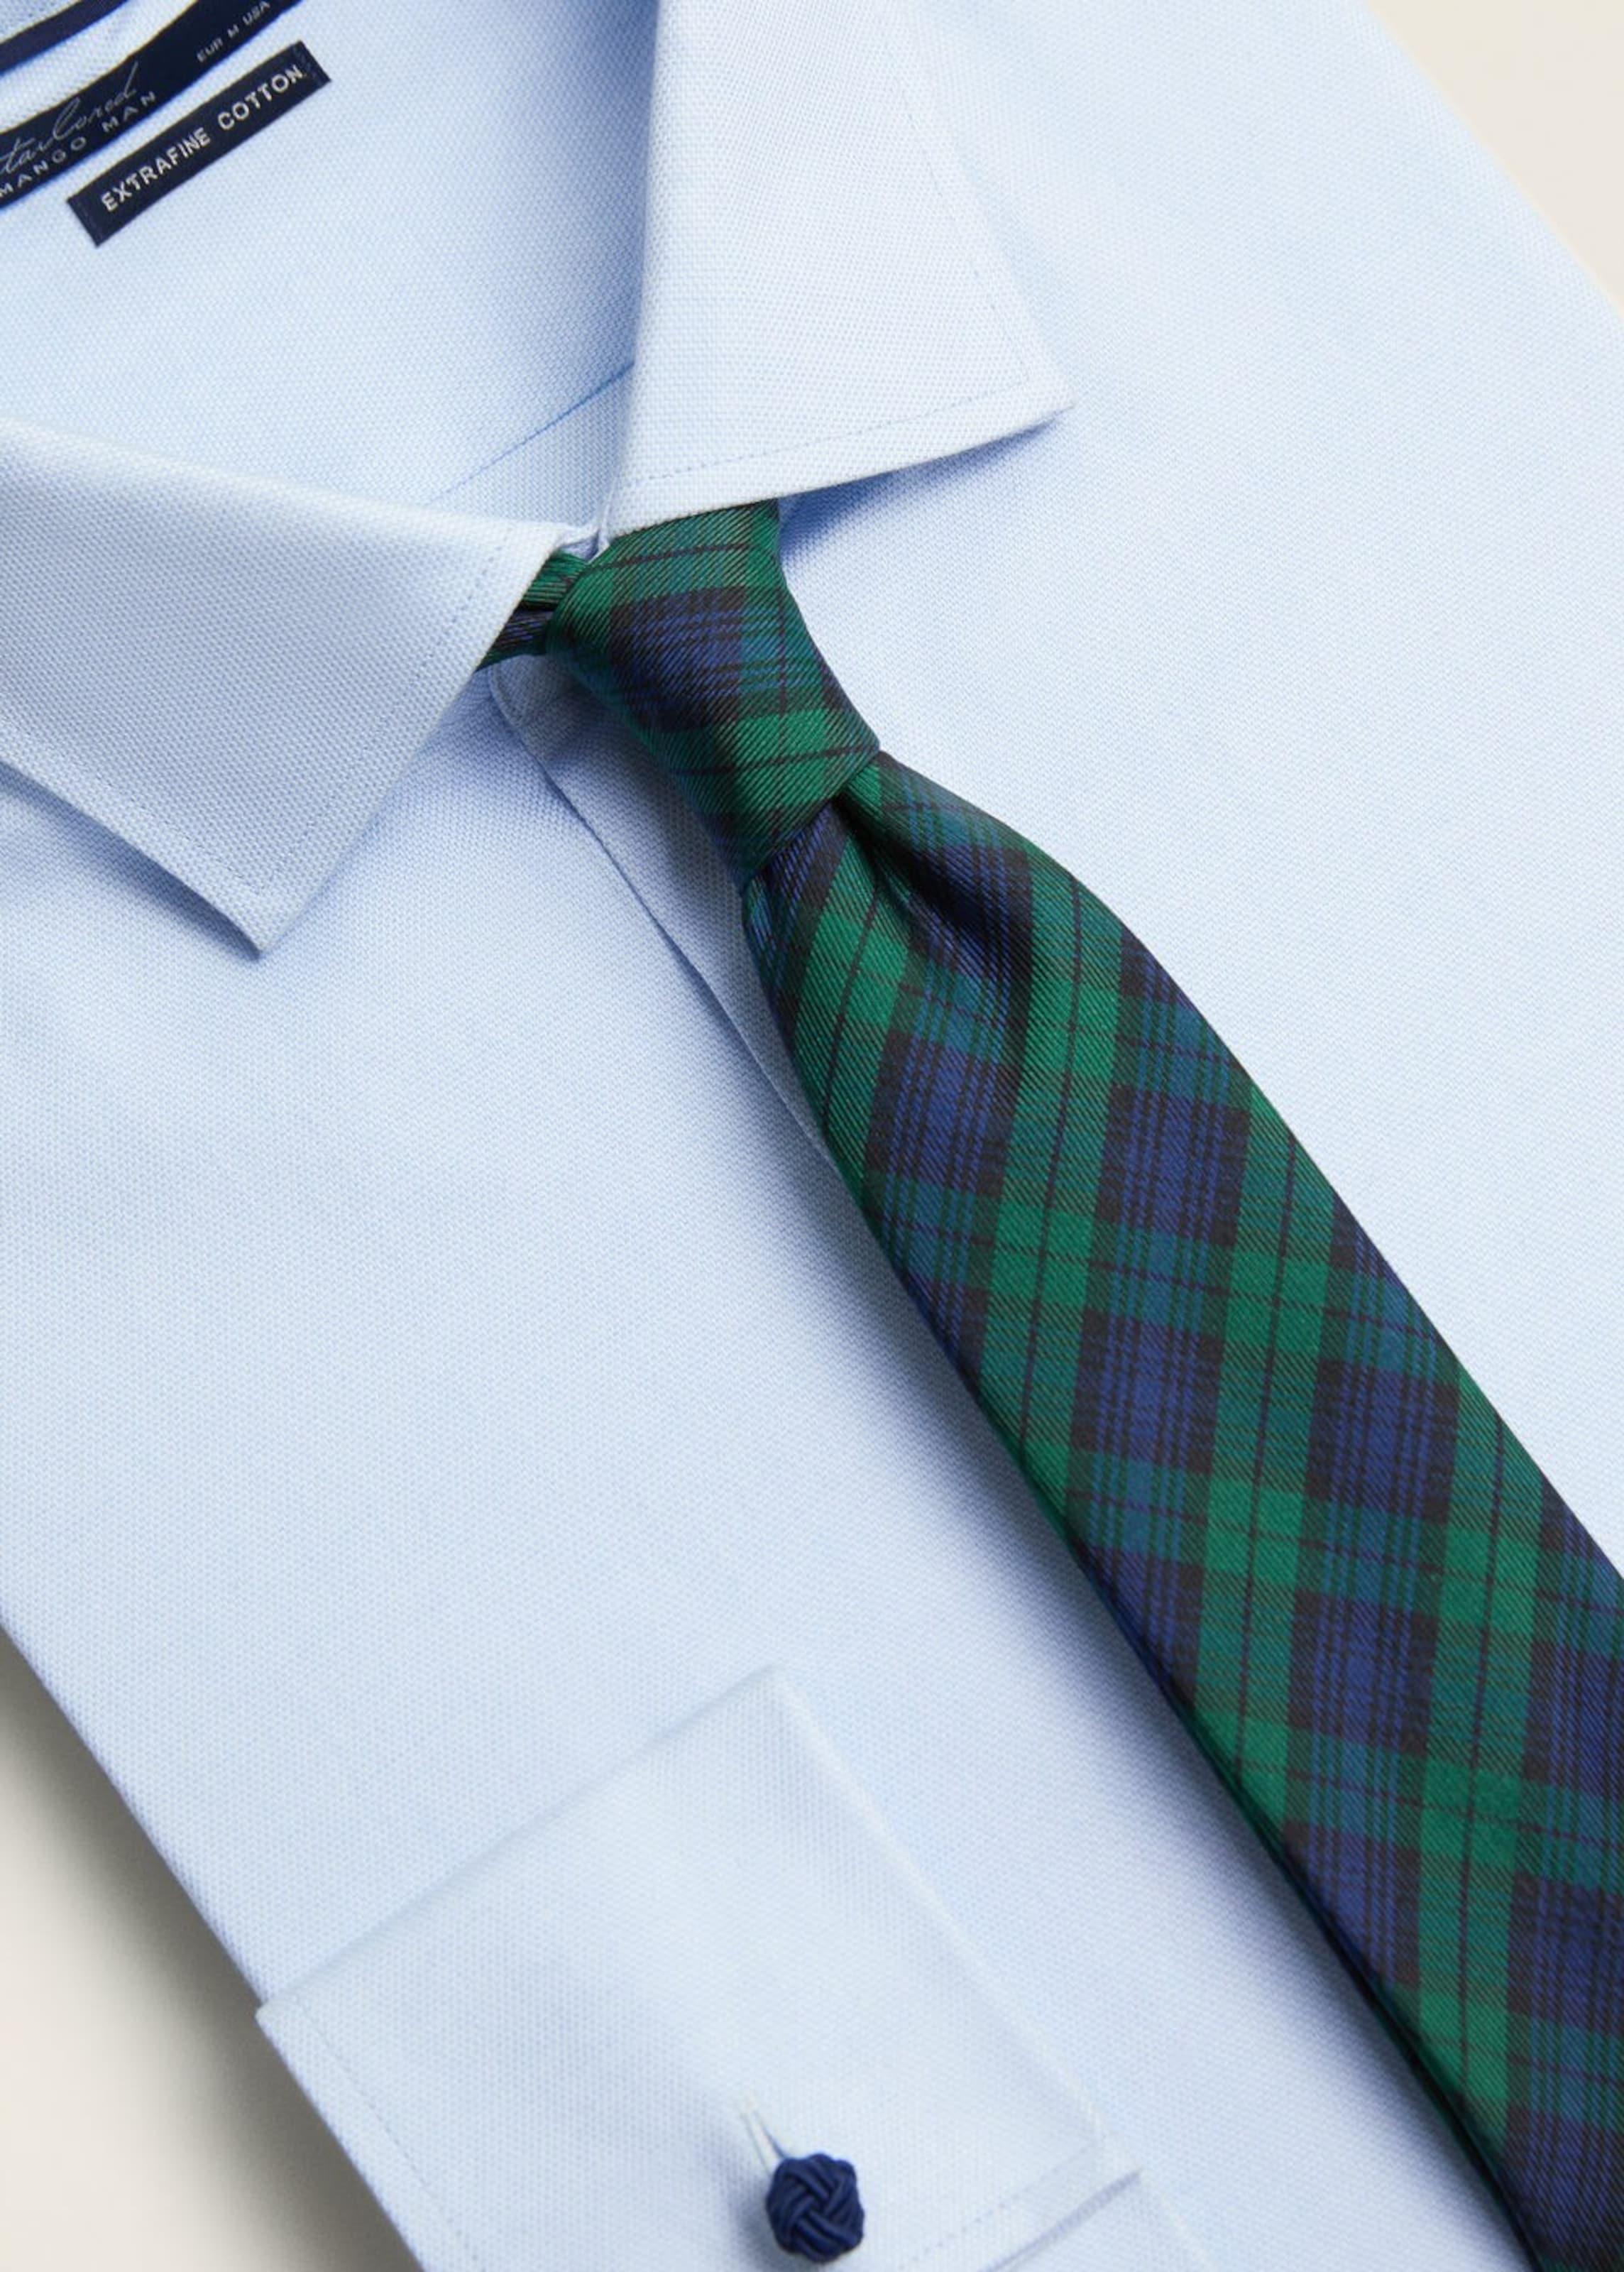 Man 'p Grün Mango e In Krawatte Check' WEDH9Y2I